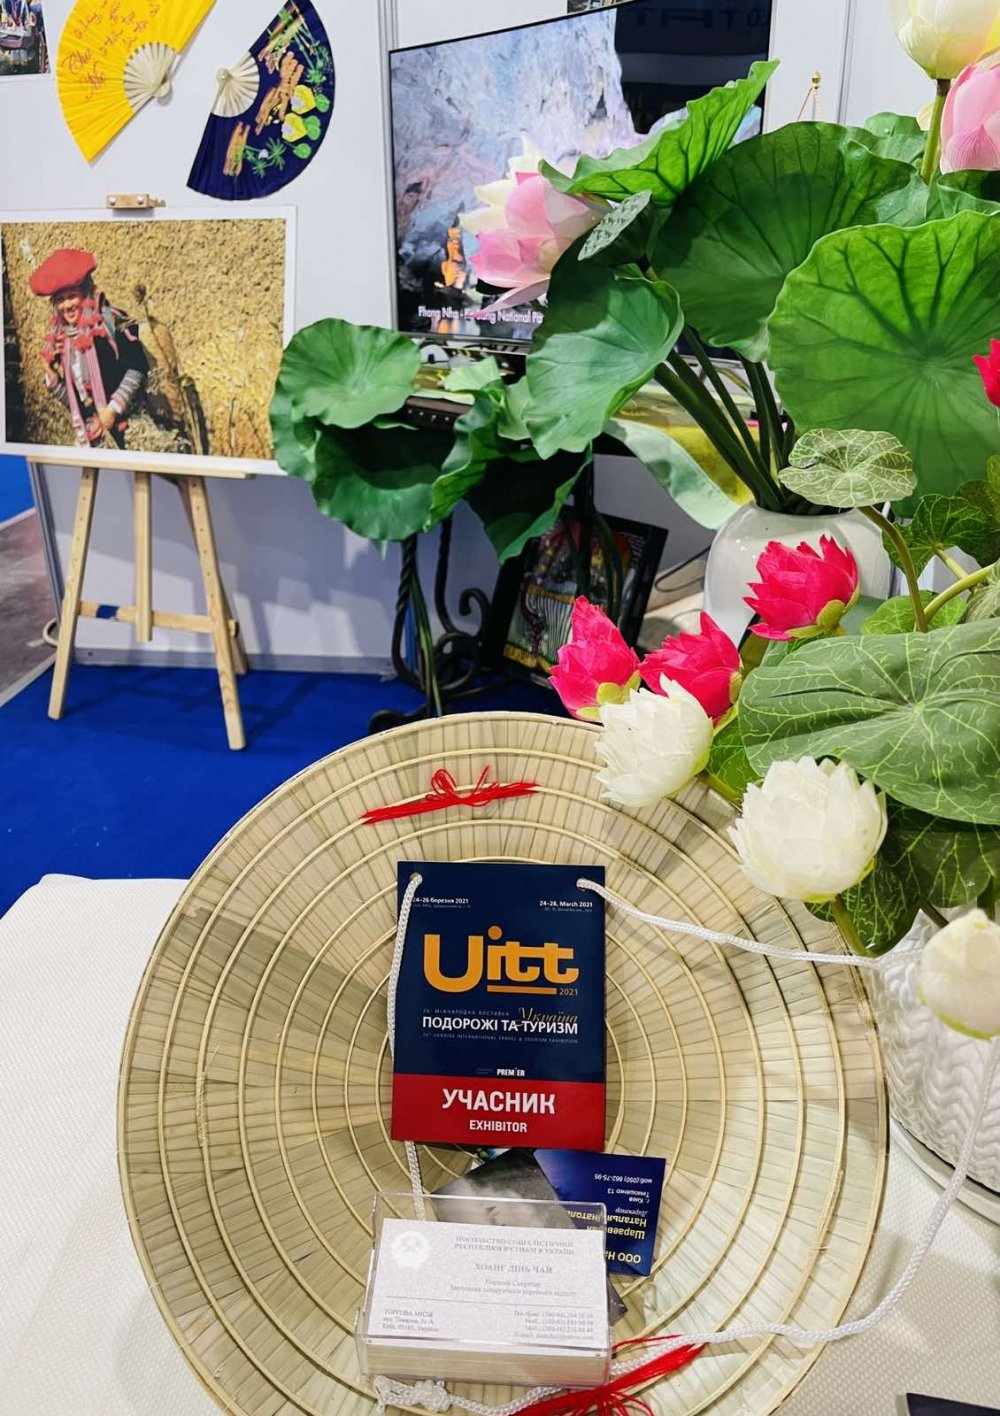 Vietnam's tourism boosted at Ukraine International Travel and Tourism Exhibition 2021